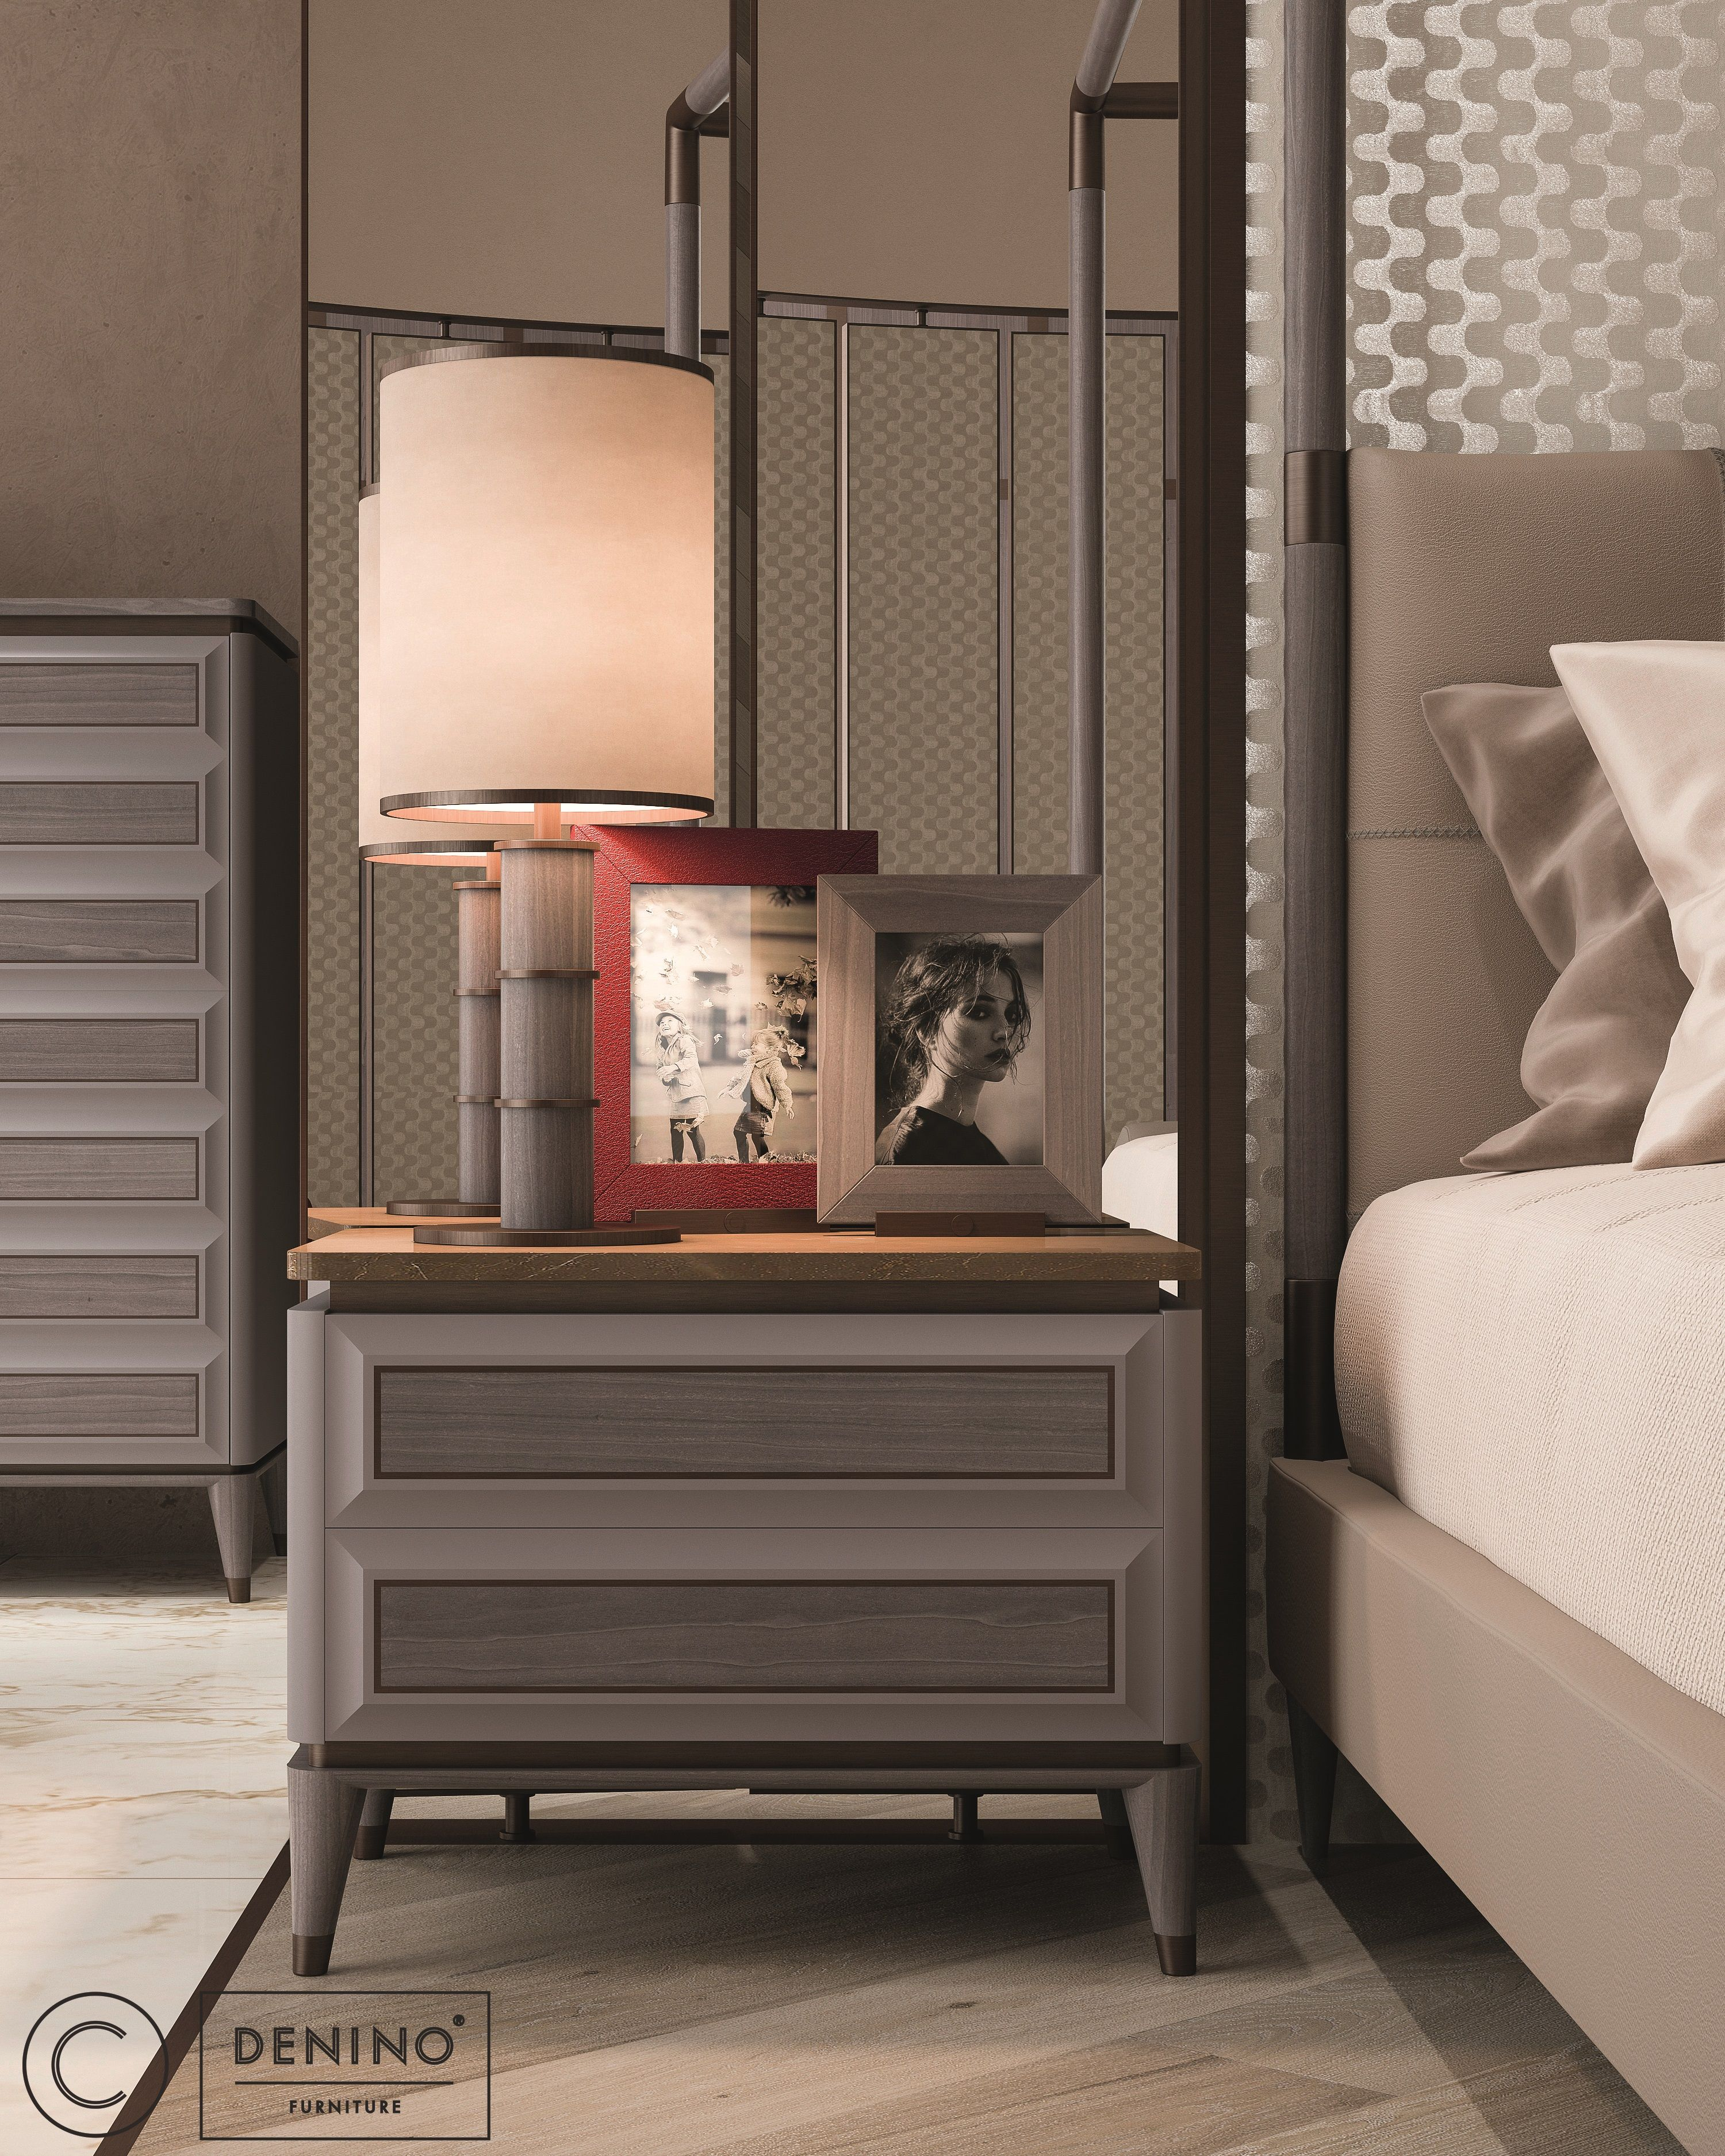 Cipriani Homood x Denino Furniture offer sophisticated